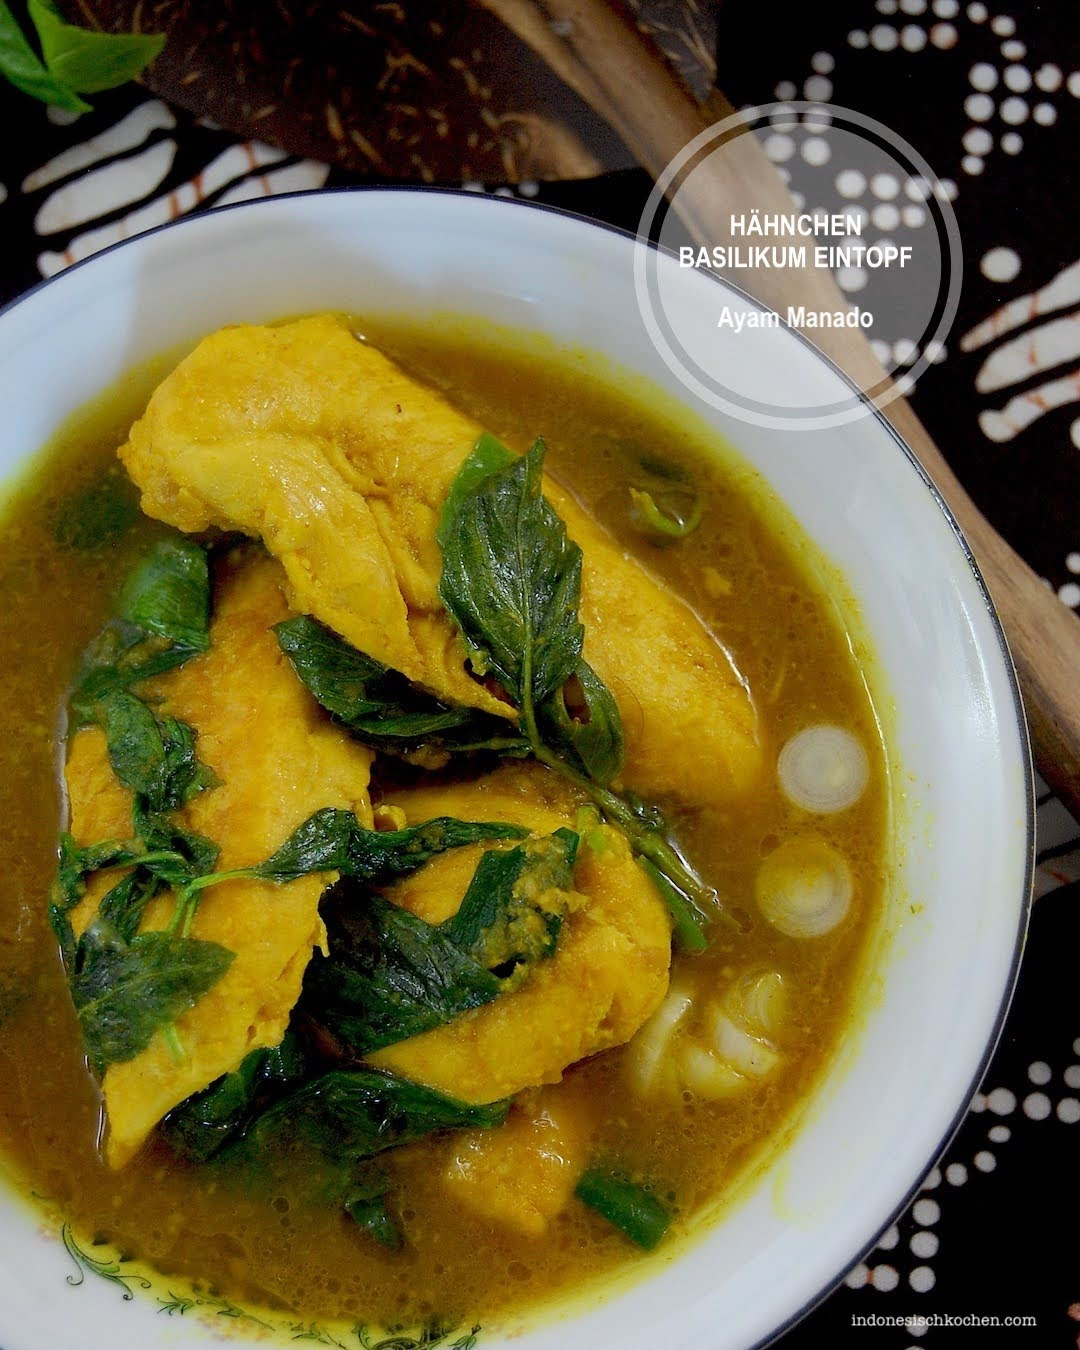 Ayam Manado, Hähnchen Basilikum Eintopf